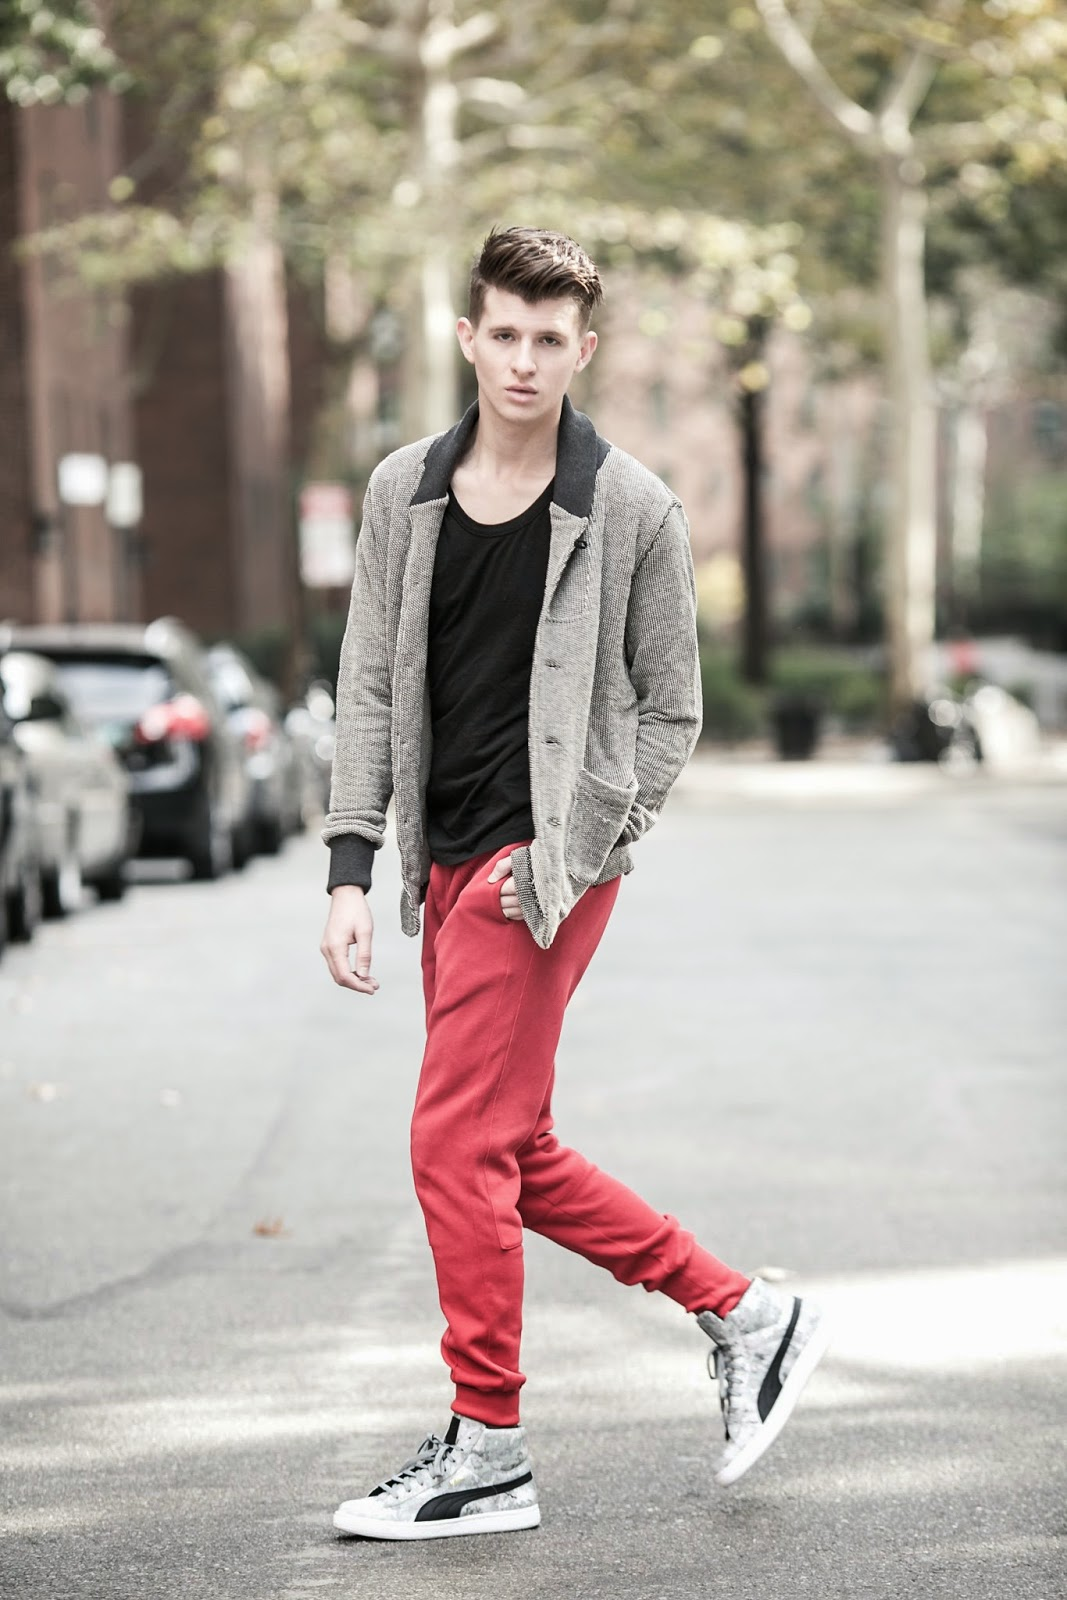 Christian%2BNYC-Favorites%2BGallery-0002.jpg